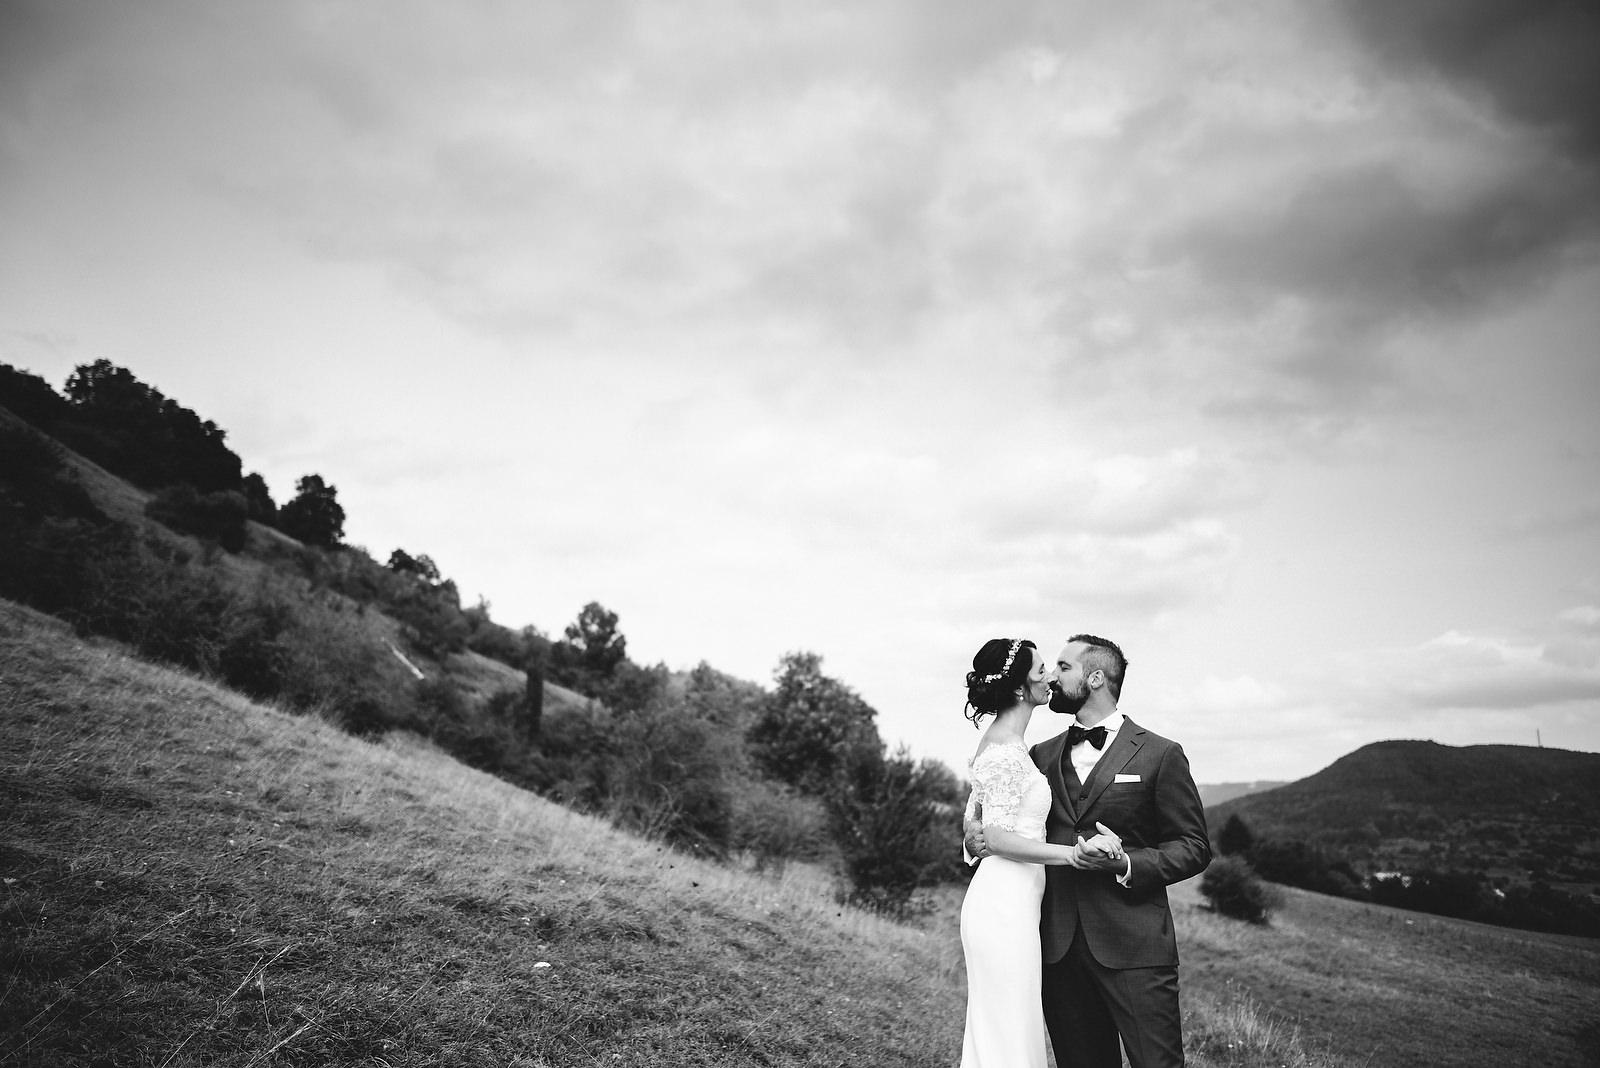 Fotograf Konstanz - Hochzeitsfotograf Reutlingen Achalm Hochzeit EFP 28 - Als Hochzeitsfotograf auf der Achalm, Reutlingen  - 22 -